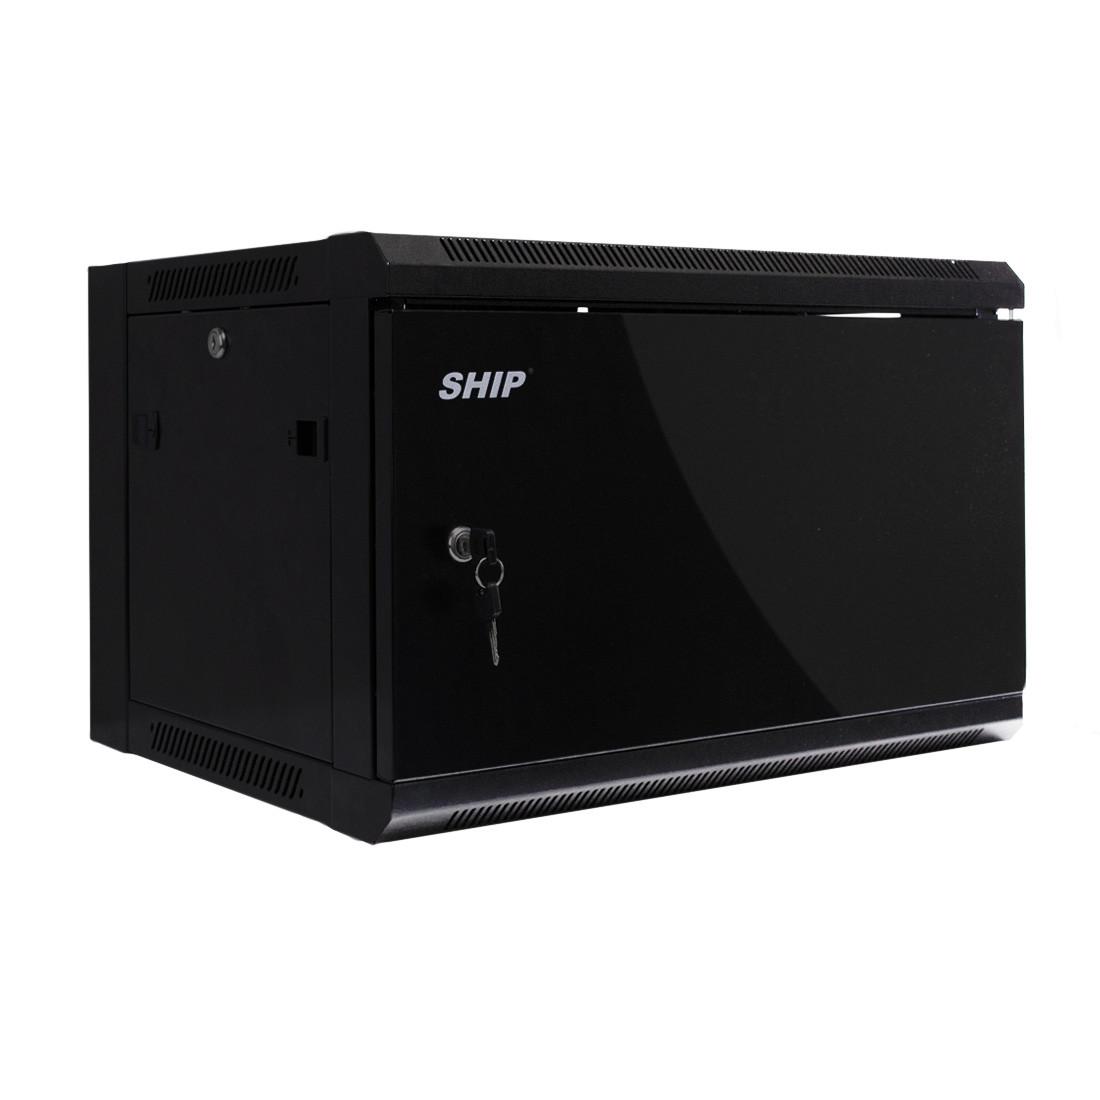 Шкаф настенный SHIP VP5412.100 12U 570*450*635 мм